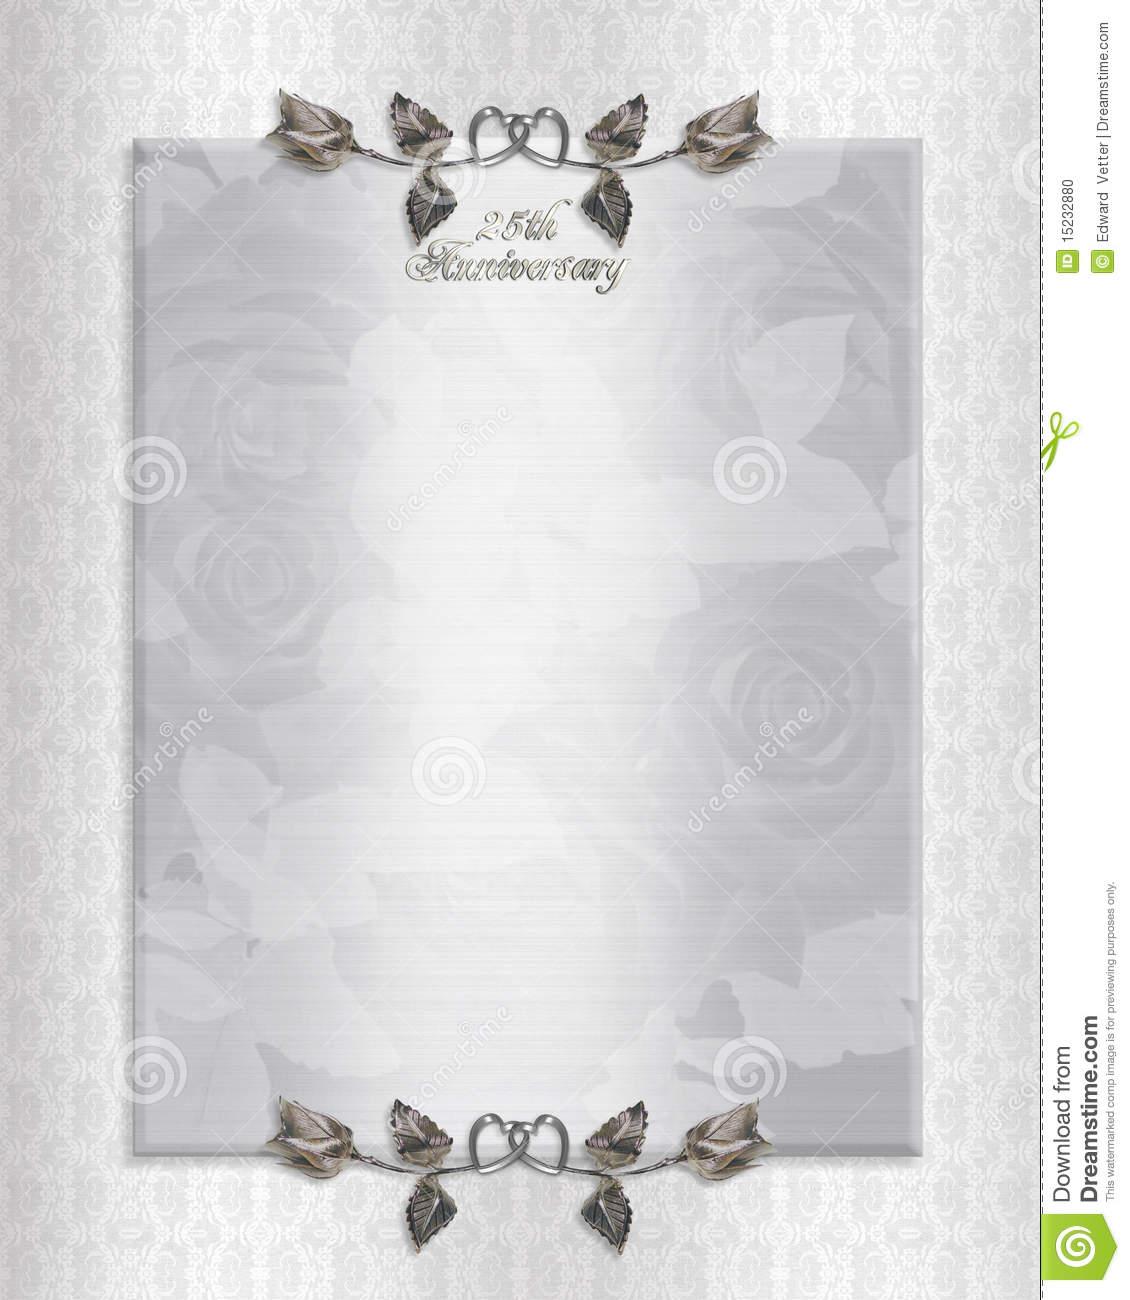 25th Silver Anniversary Invitation Stock Illustration